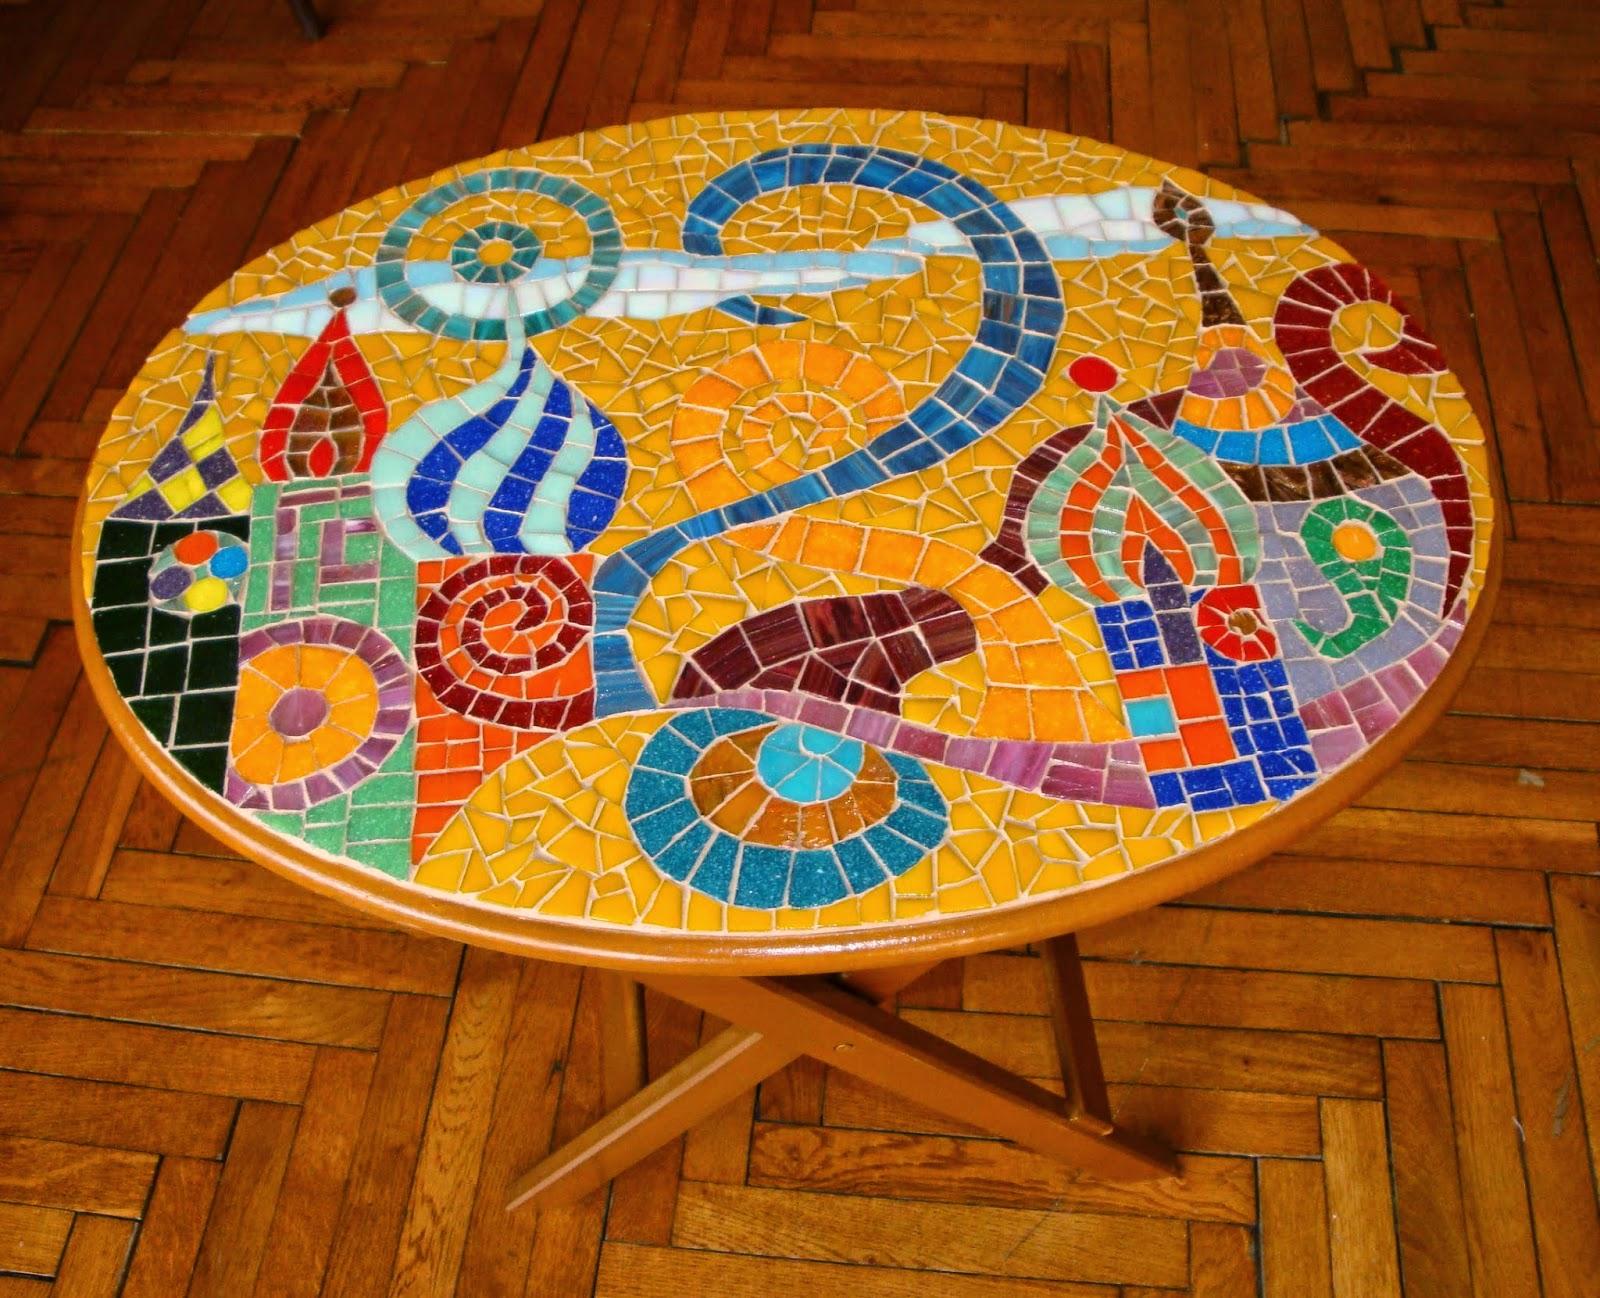 1001 Nights Mosaic Coffee Table 2013.JPG